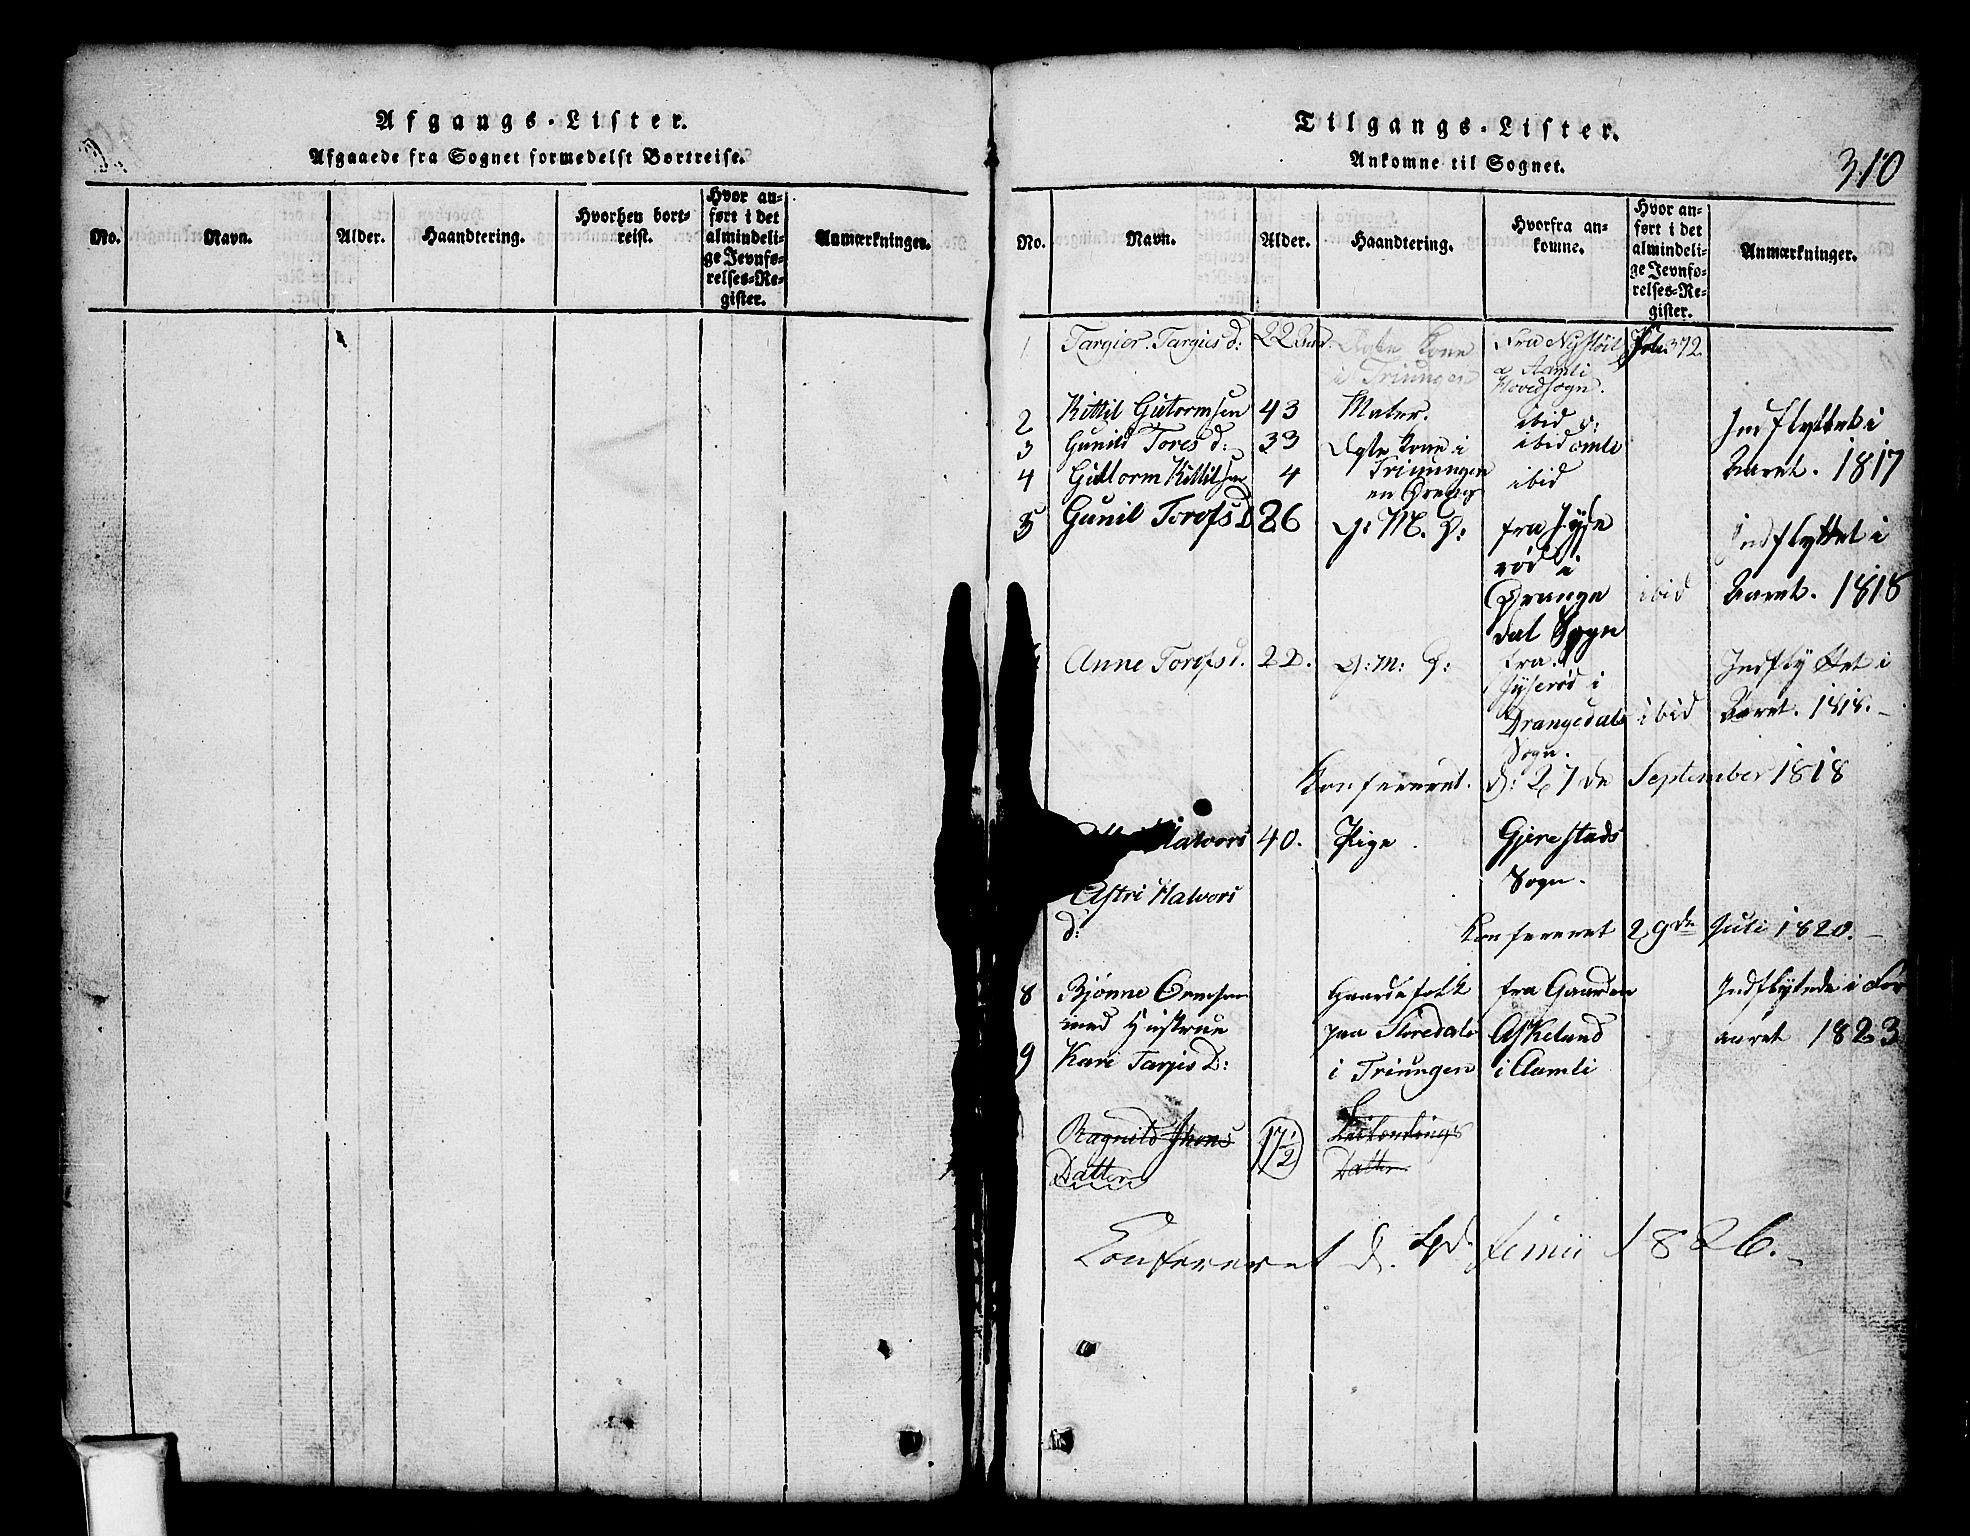 SAKO, Nissedal kirkebøker, G/Gb/L0001: Klokkerbok nr. II 1, 1814-1862, s. 310